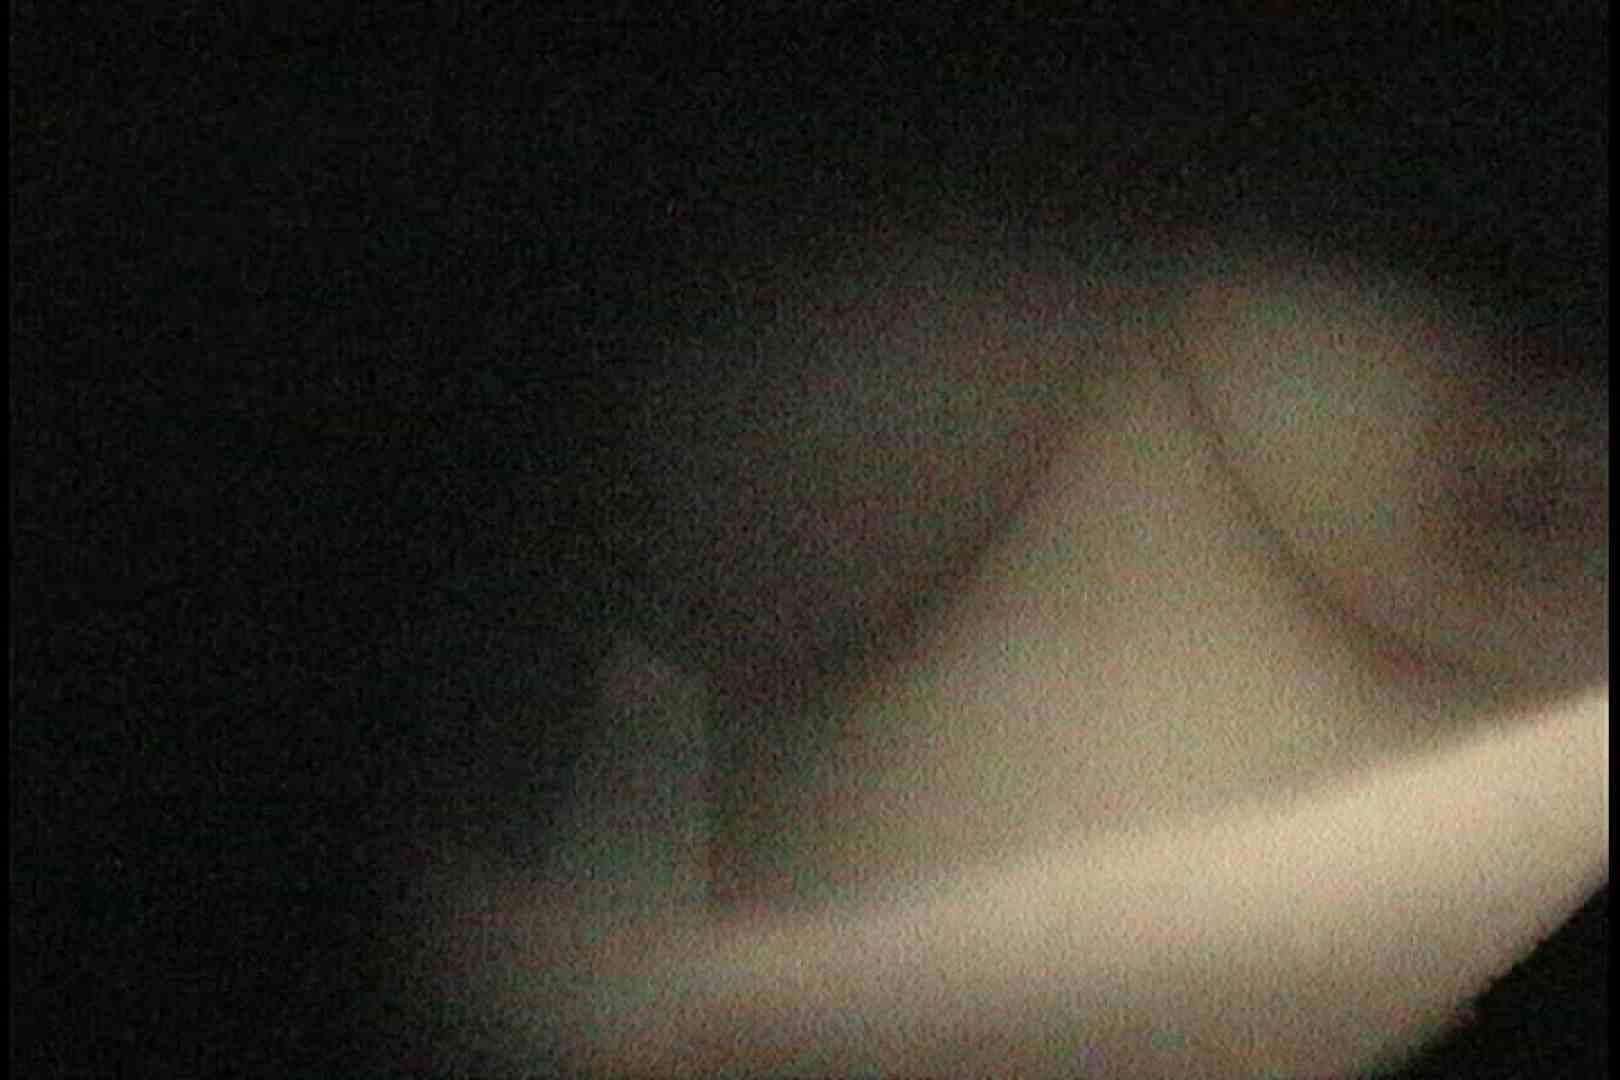 No.68 見事に可愛い巨乳ちゃん 室内暗いです シャワー スケベ動画紹介 41画像 21